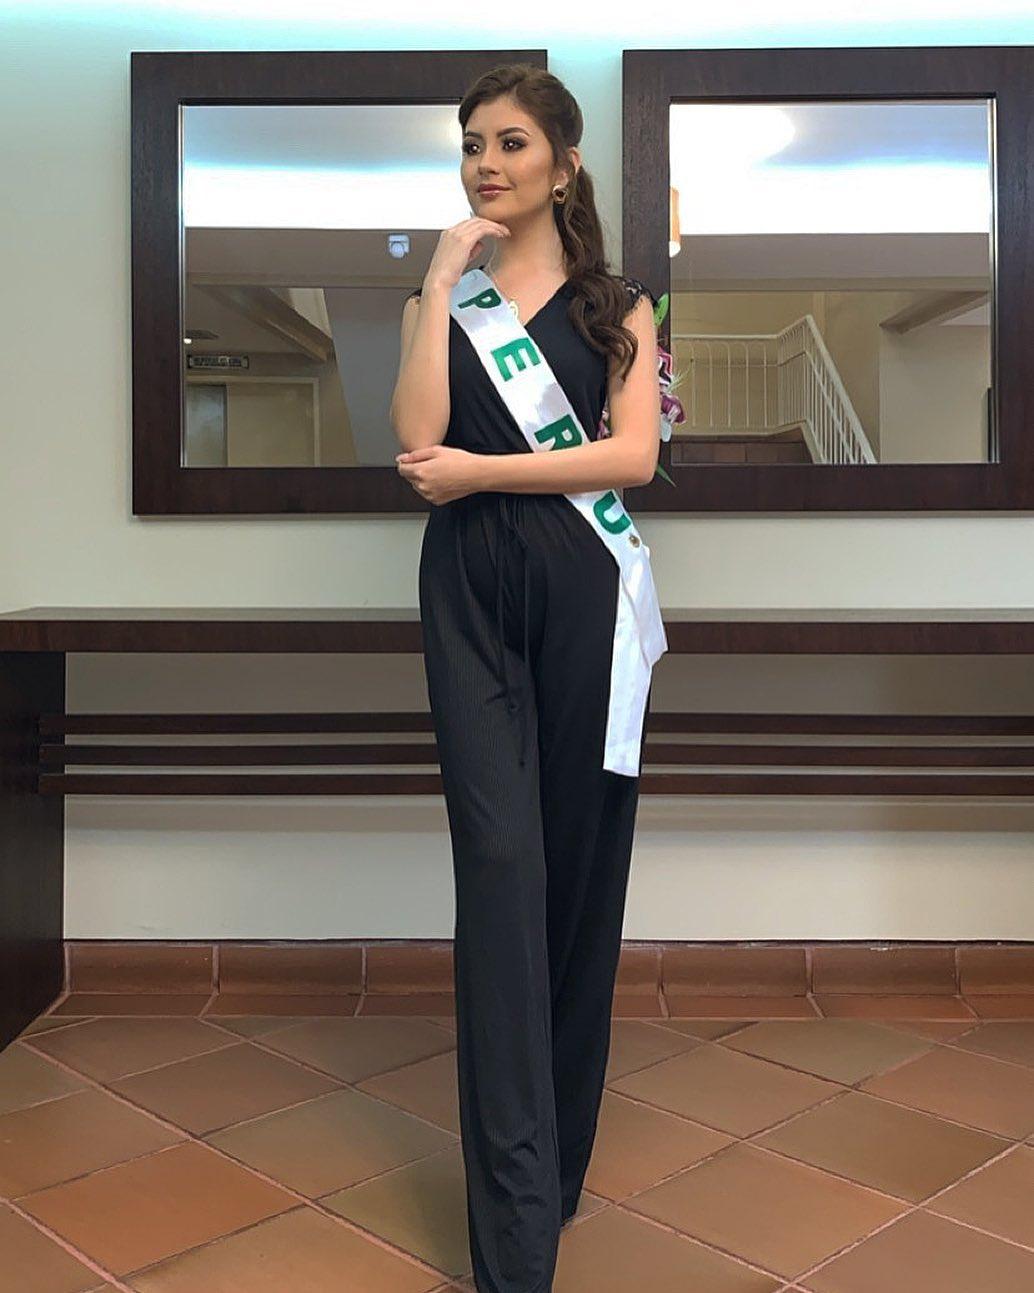 alexandra pinillos, 3ra finalista de reyna mundial banano 2019. - Página 2 69182010